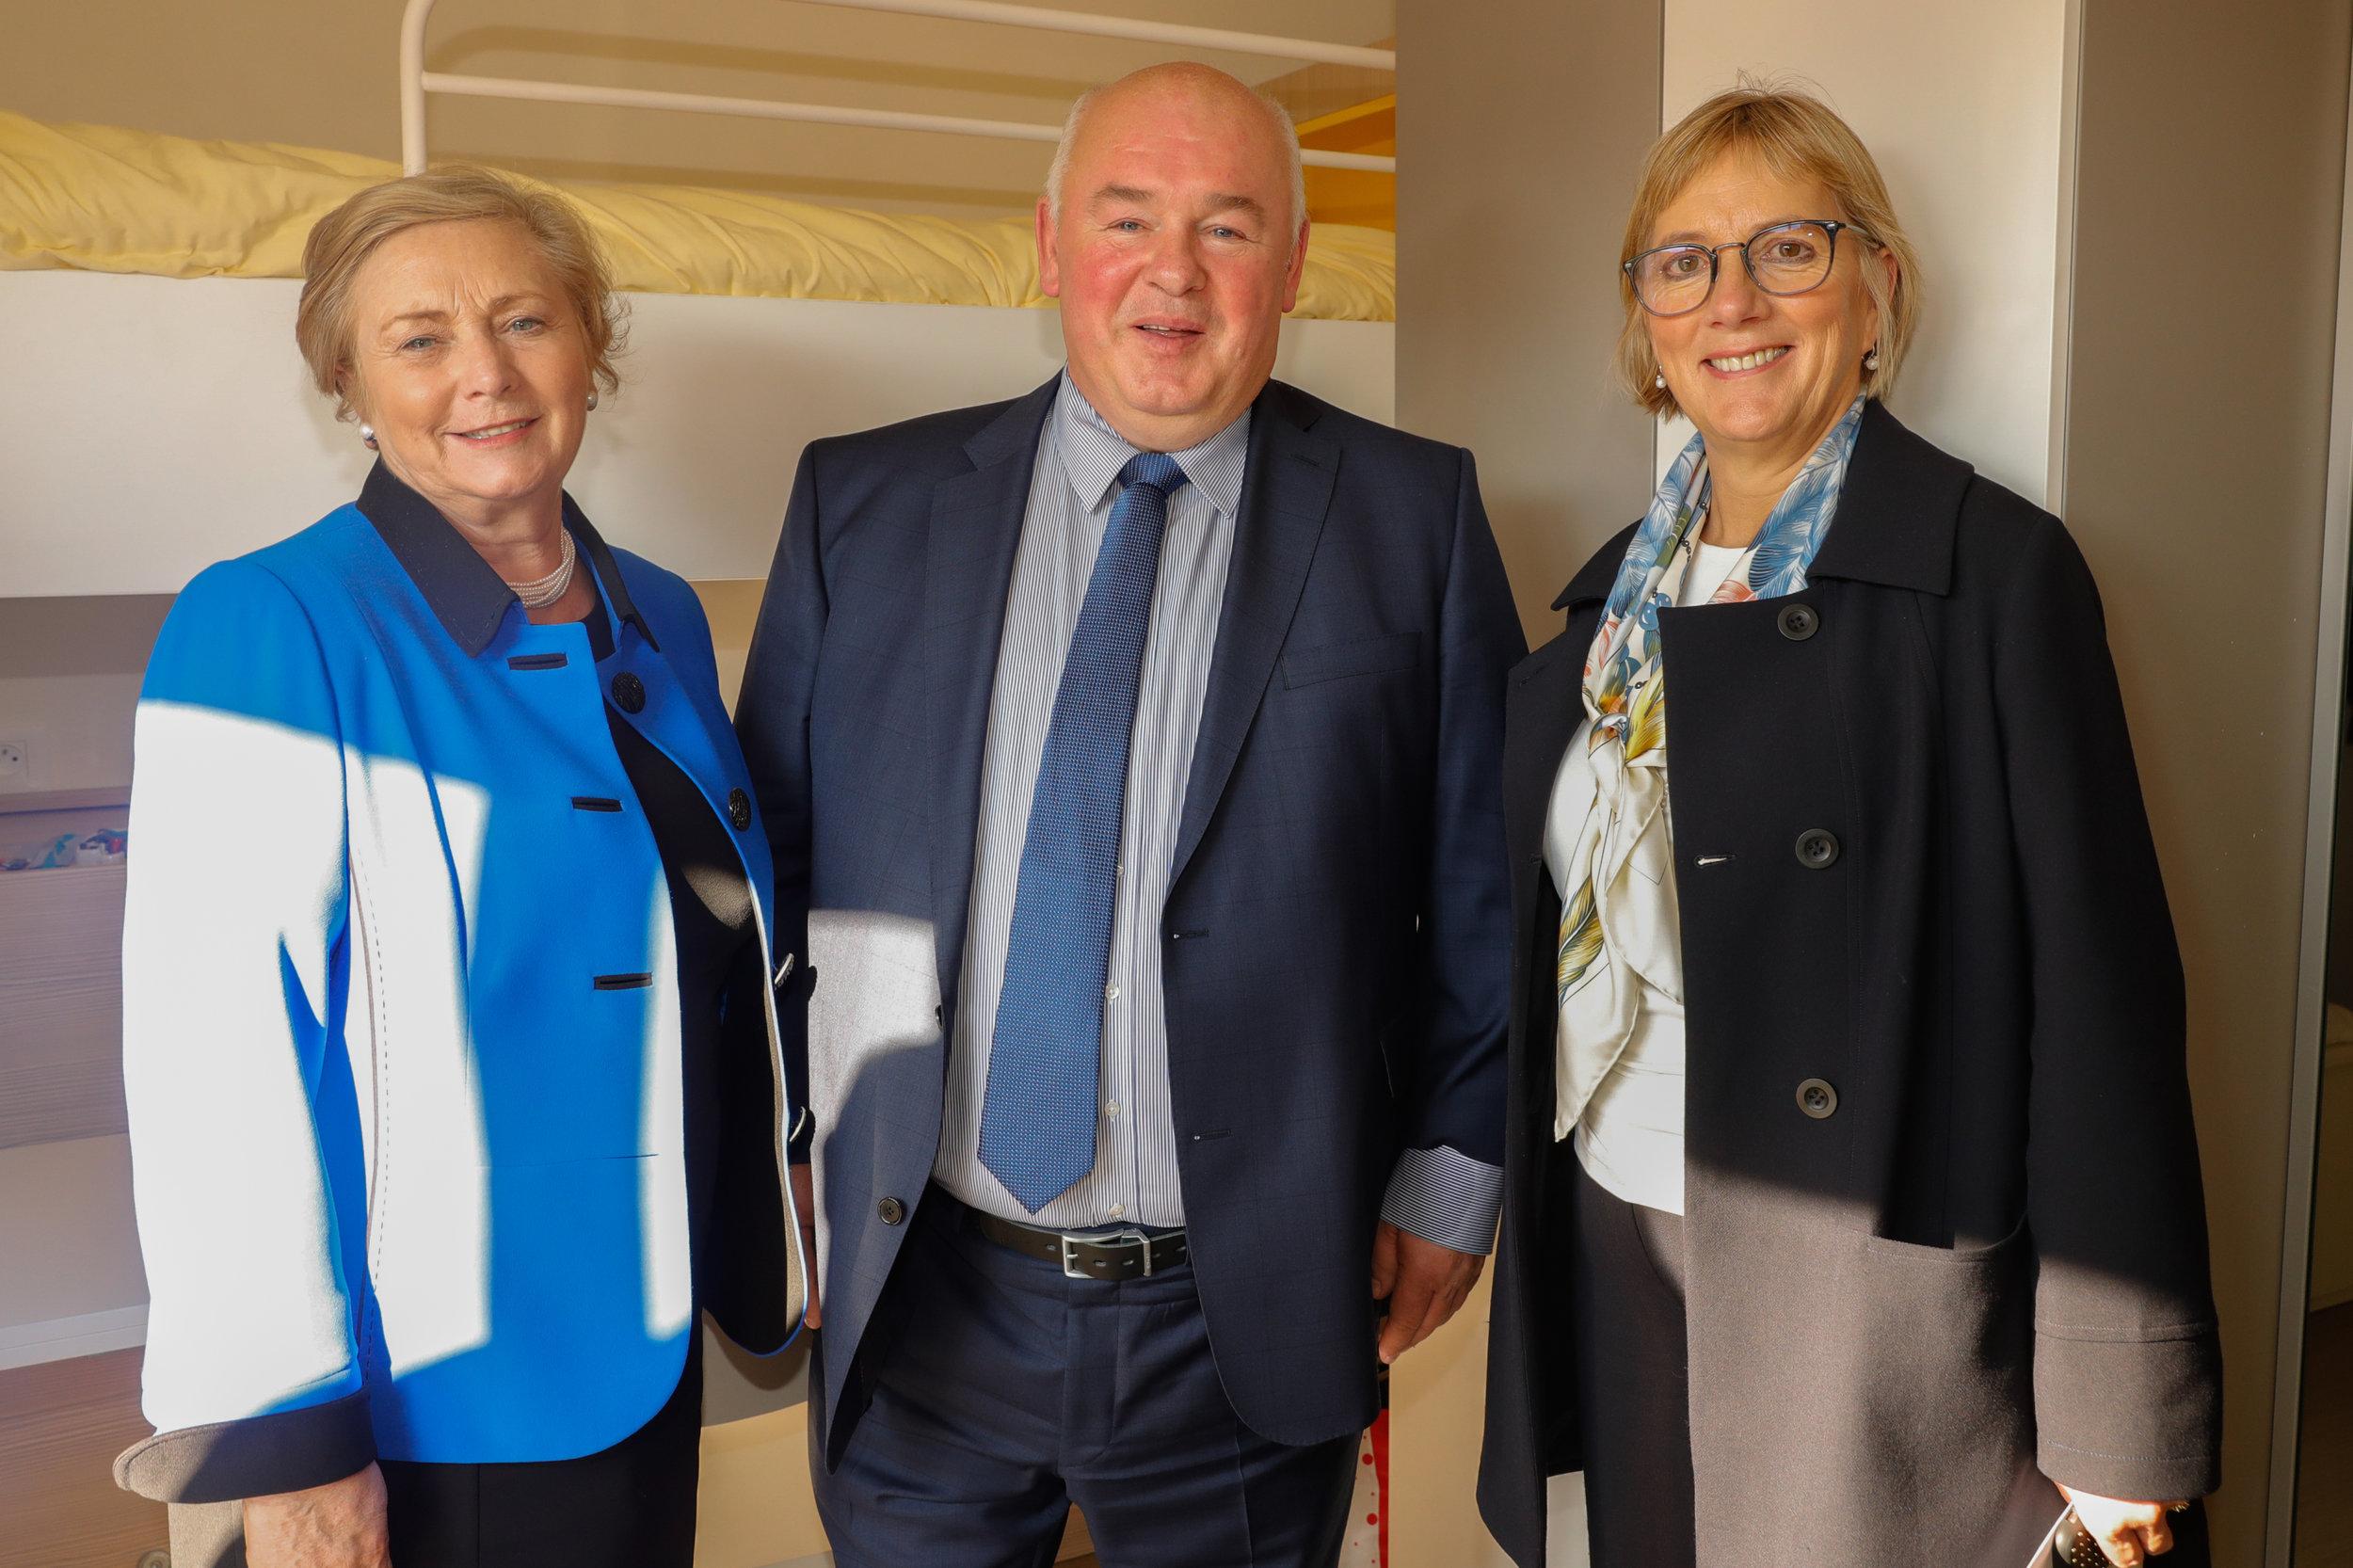 From left to right: An Tánaiste - Frances Fitzgerald , Paul Byrne - Managing Director Castlebrook, Julie Sinnamon - CEO Enterprise Ireland